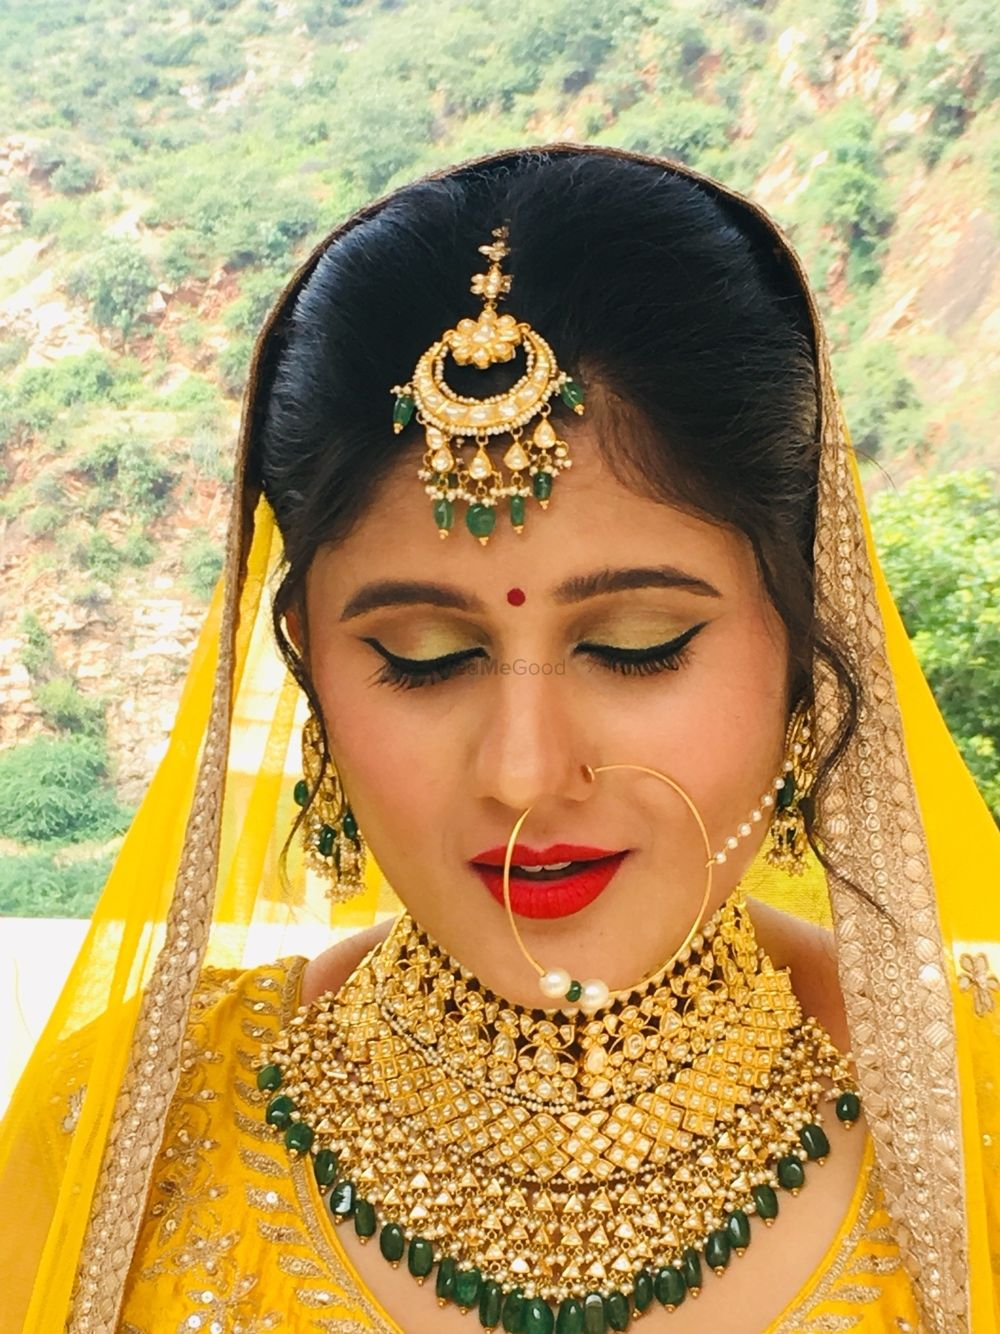 Photo From Nidhi - By Yogesh Sharma Make Up Artist